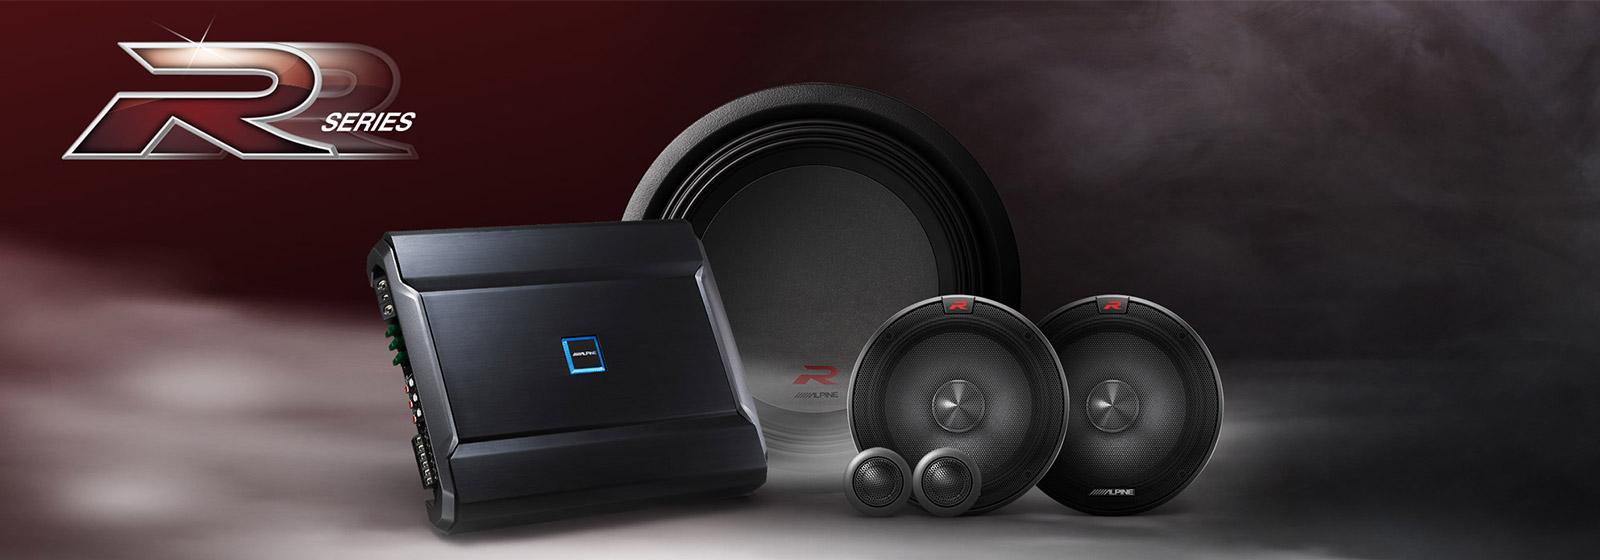 The Alpine R-Series Sound Components